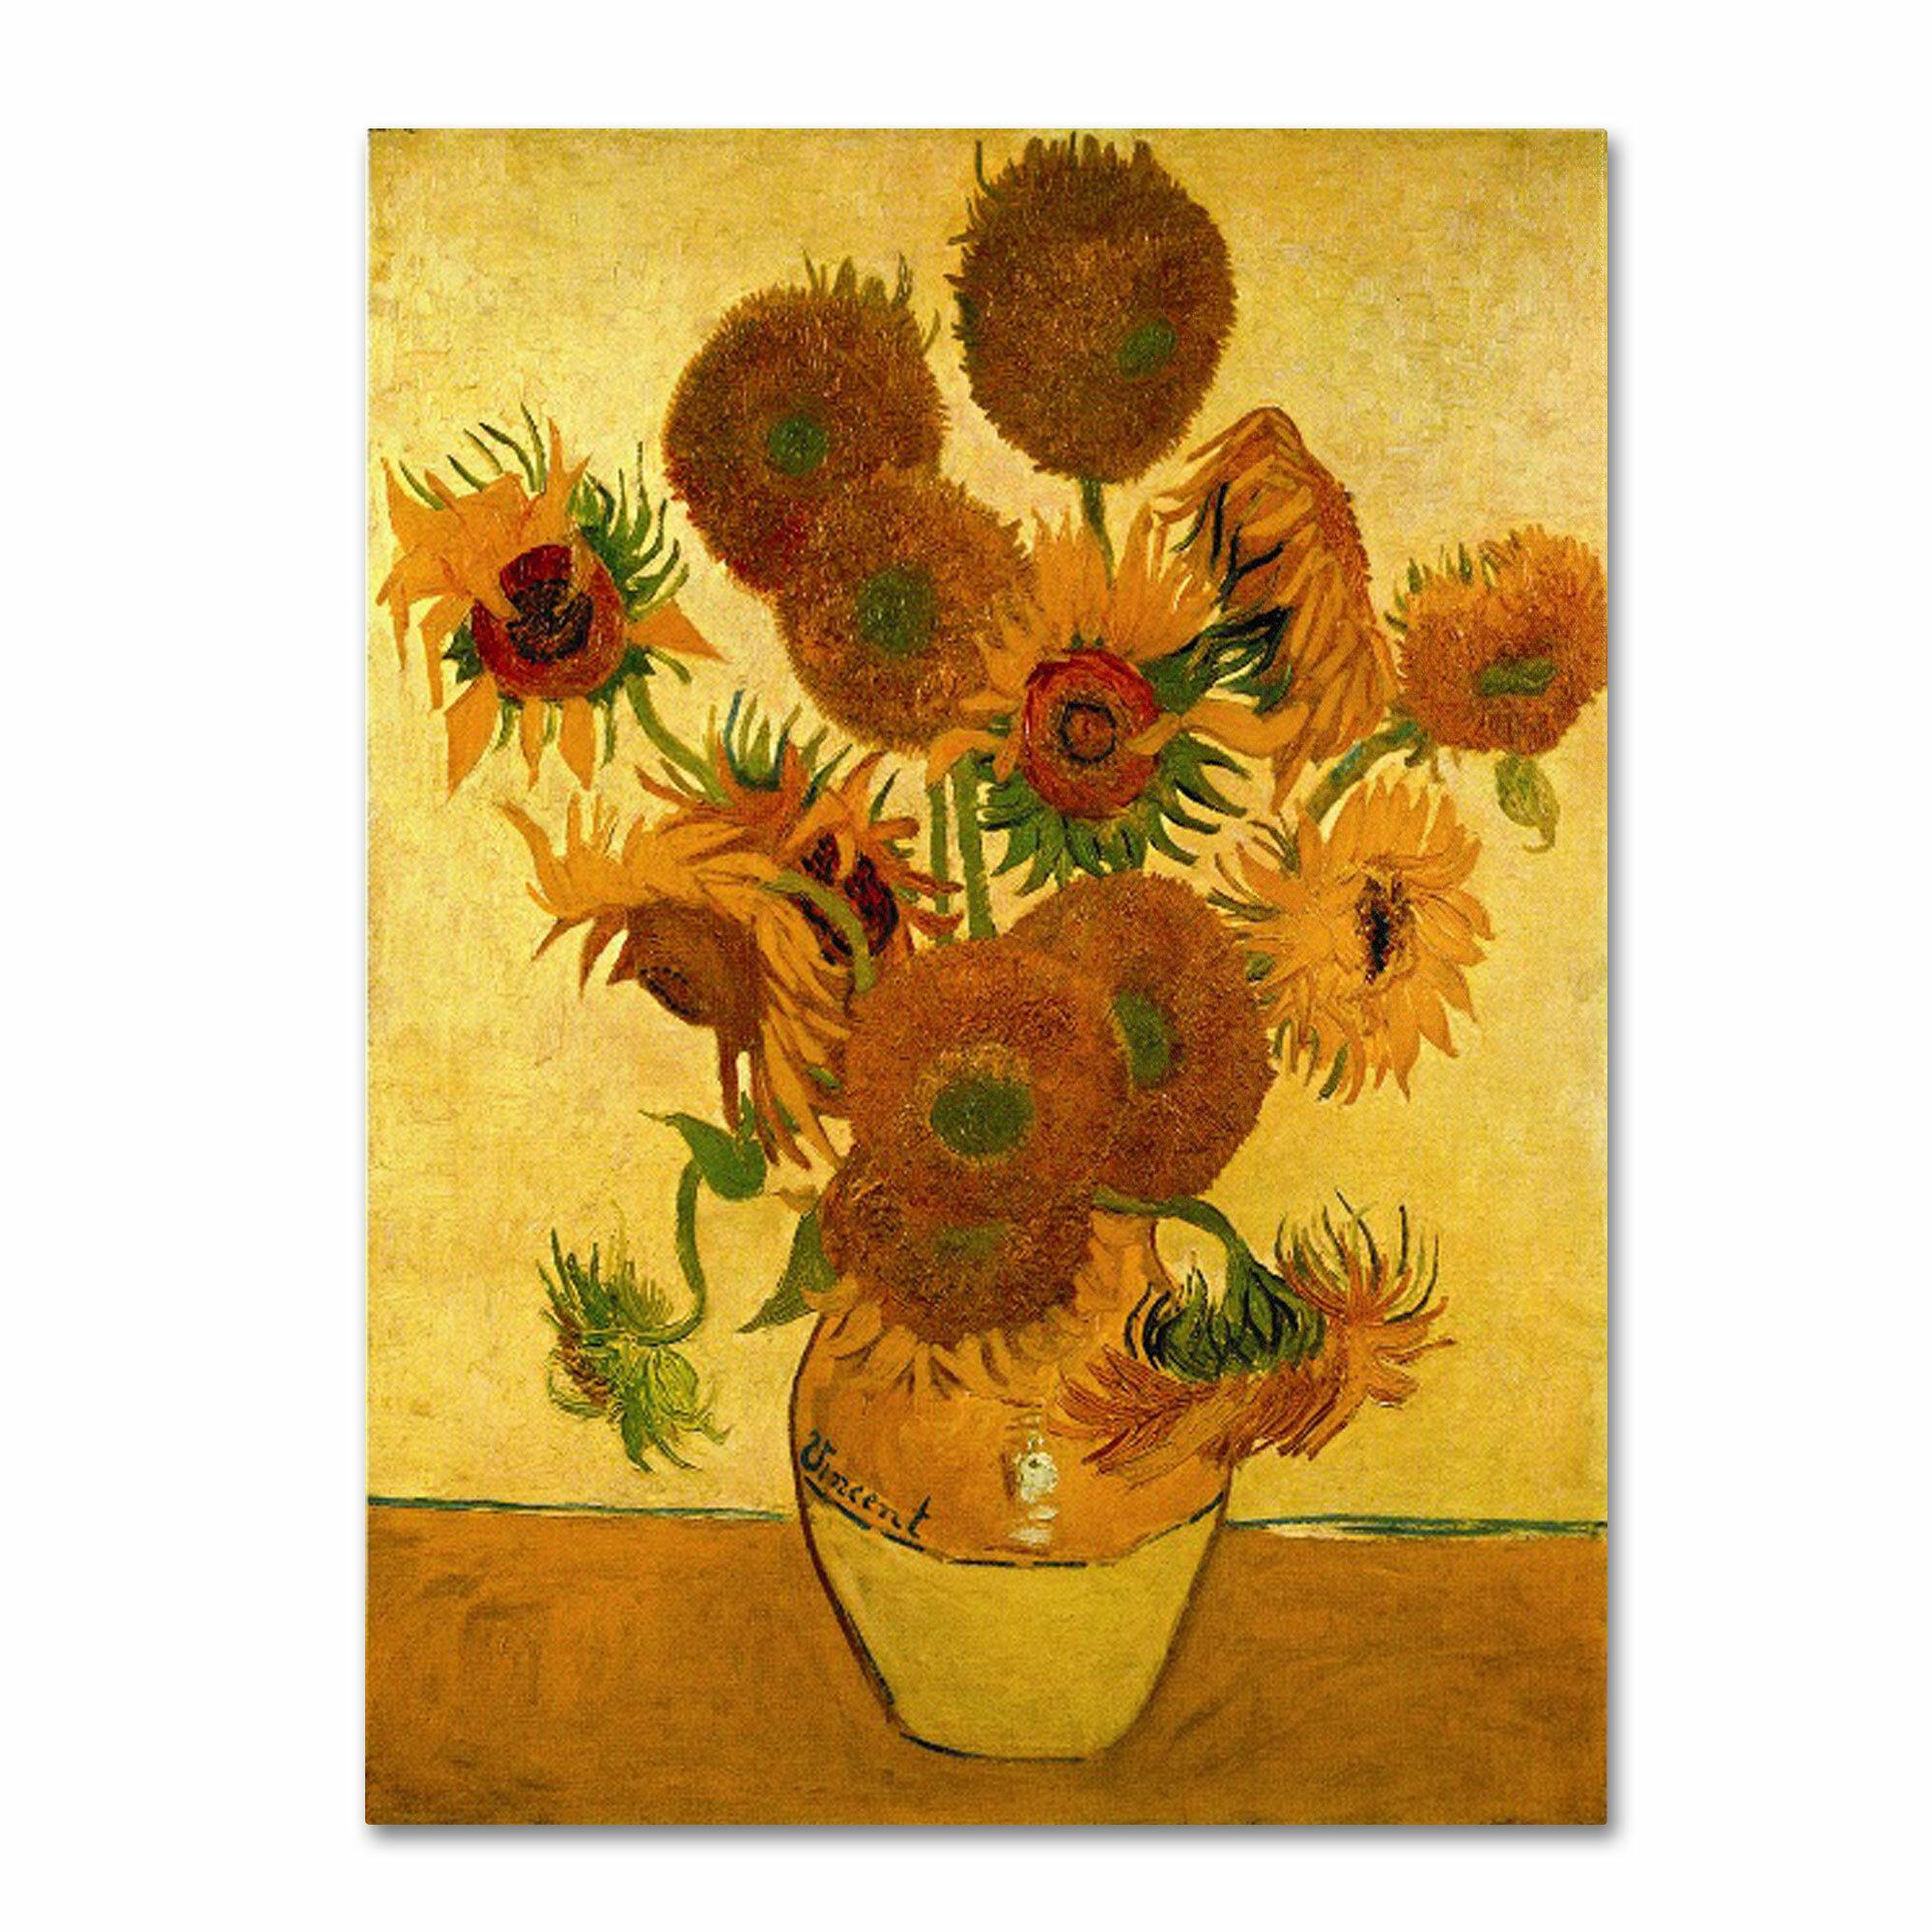 62b0bfd6c37 Fleur De Lis Living  Vase with Sunflowers  by Vincent Van Gogh Painting  Print on Canvas   Reviews